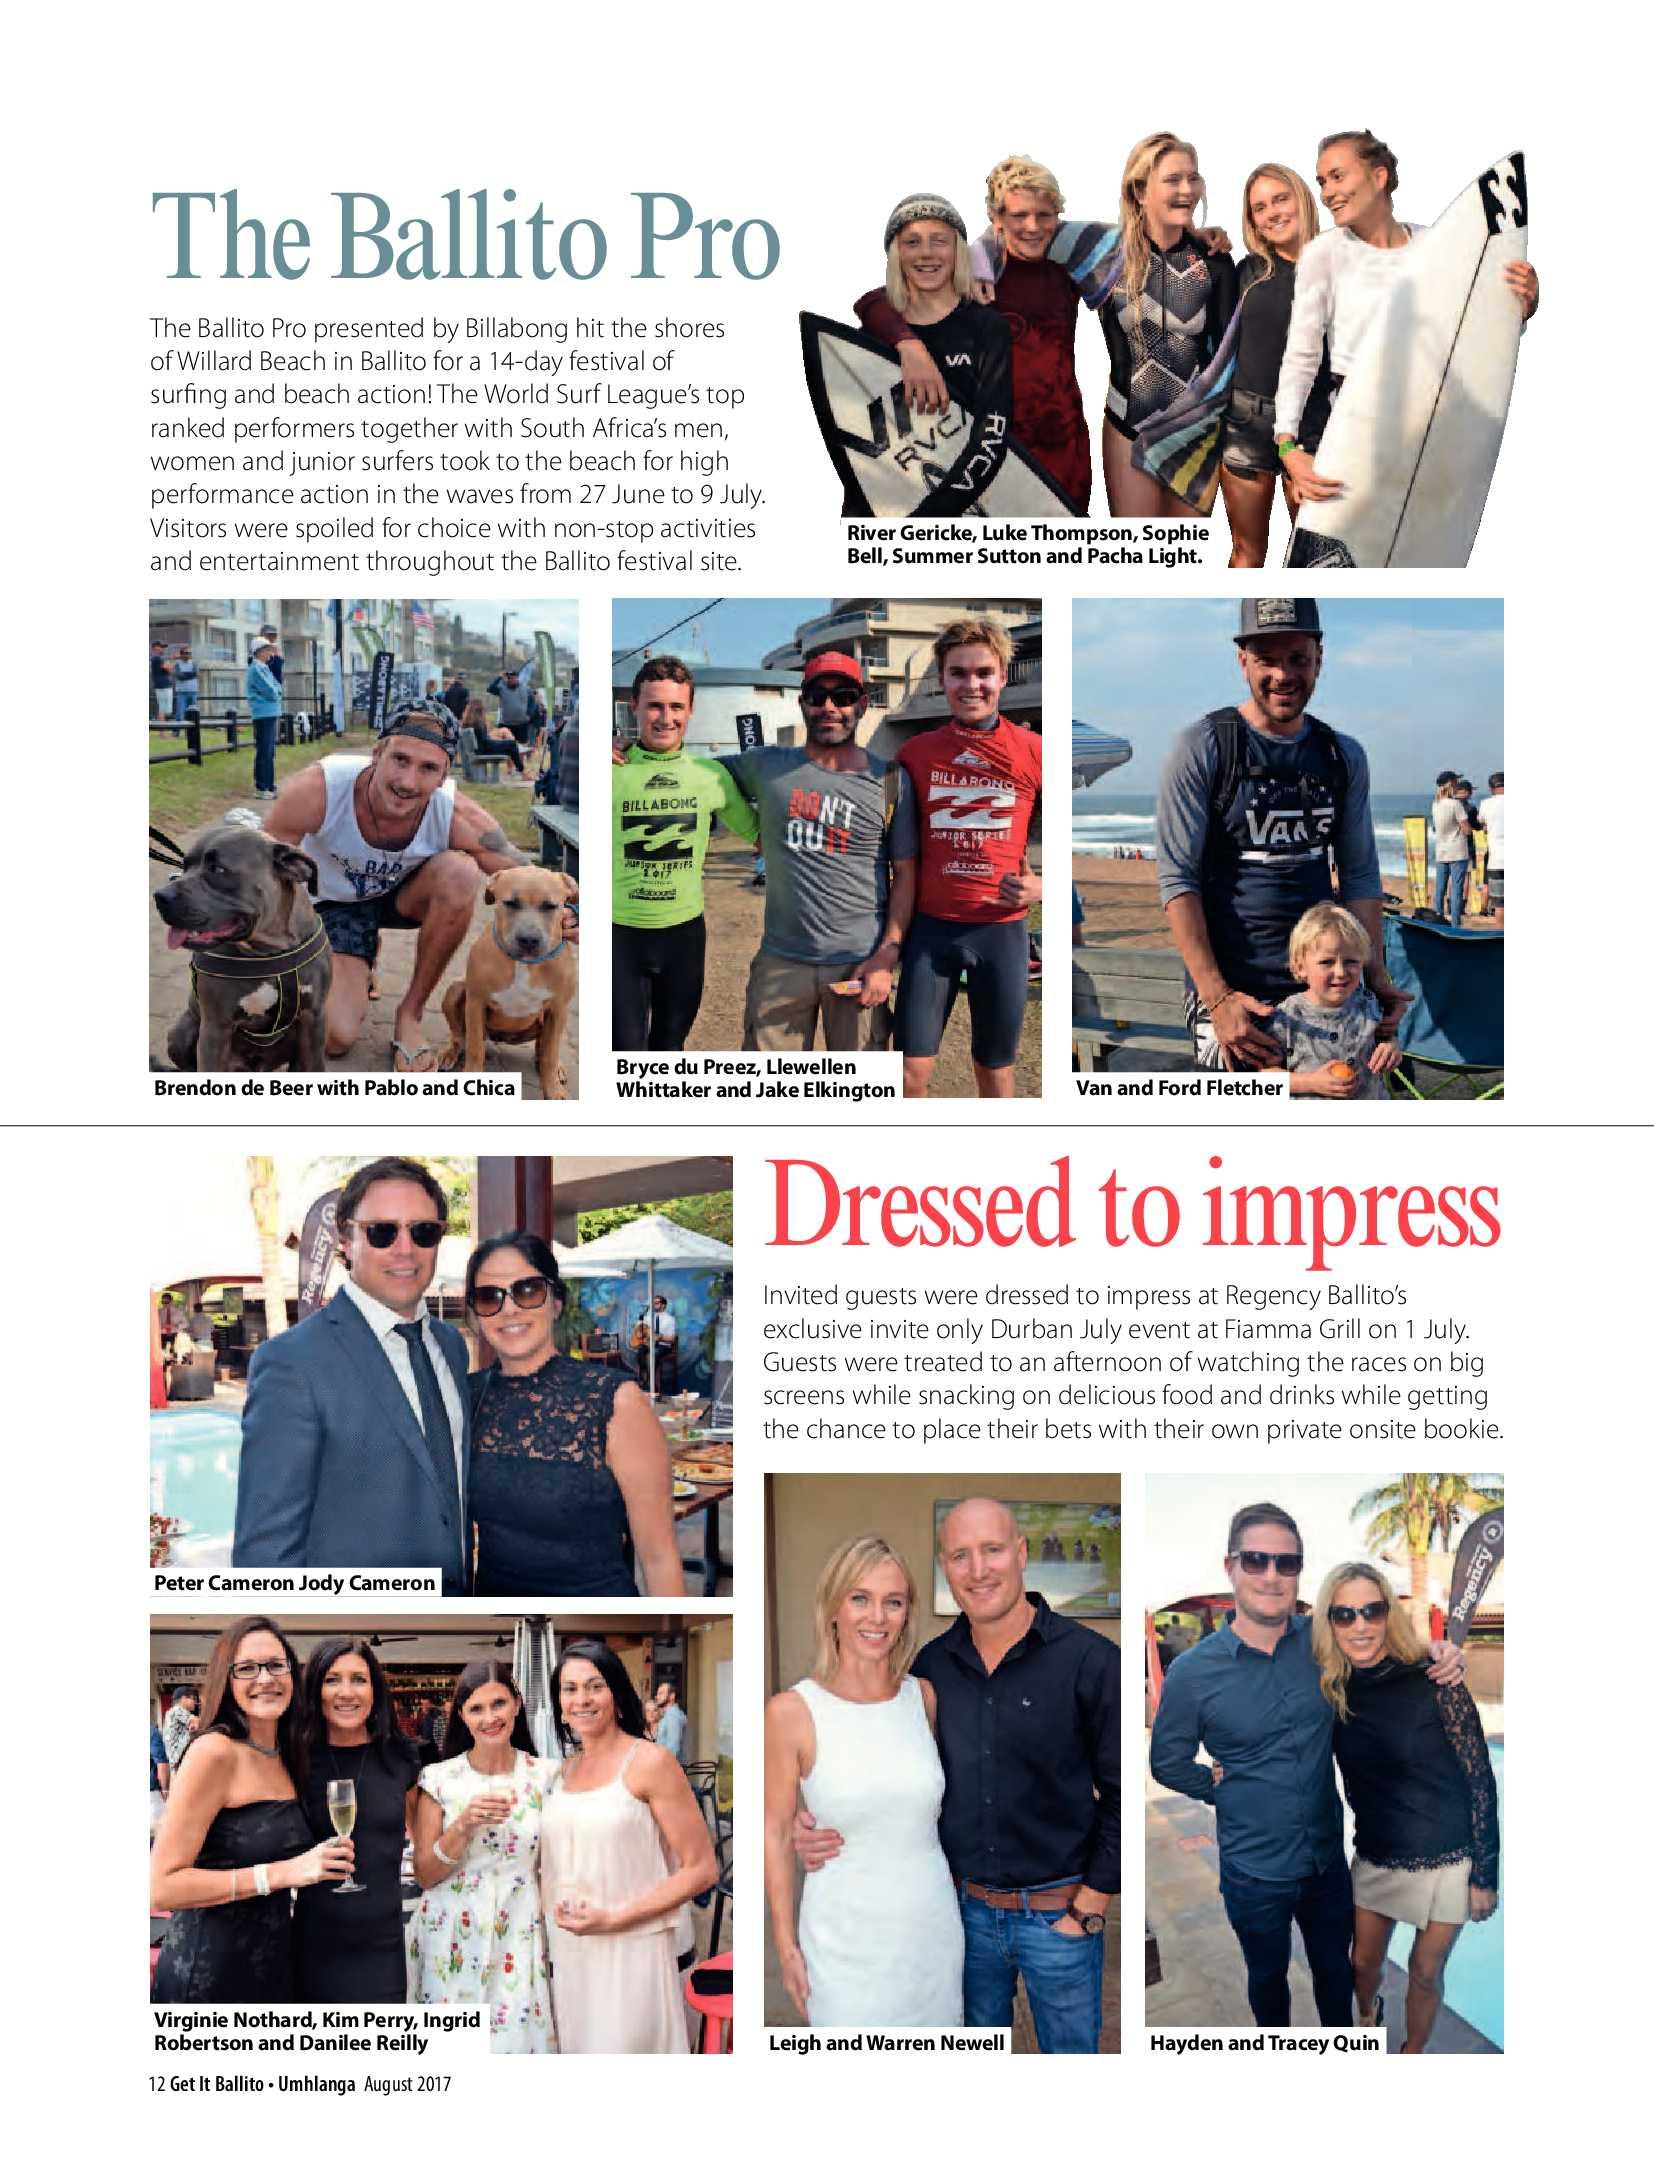 get-magazine-ballitoumhlanga-august-2017-epapers-page-14